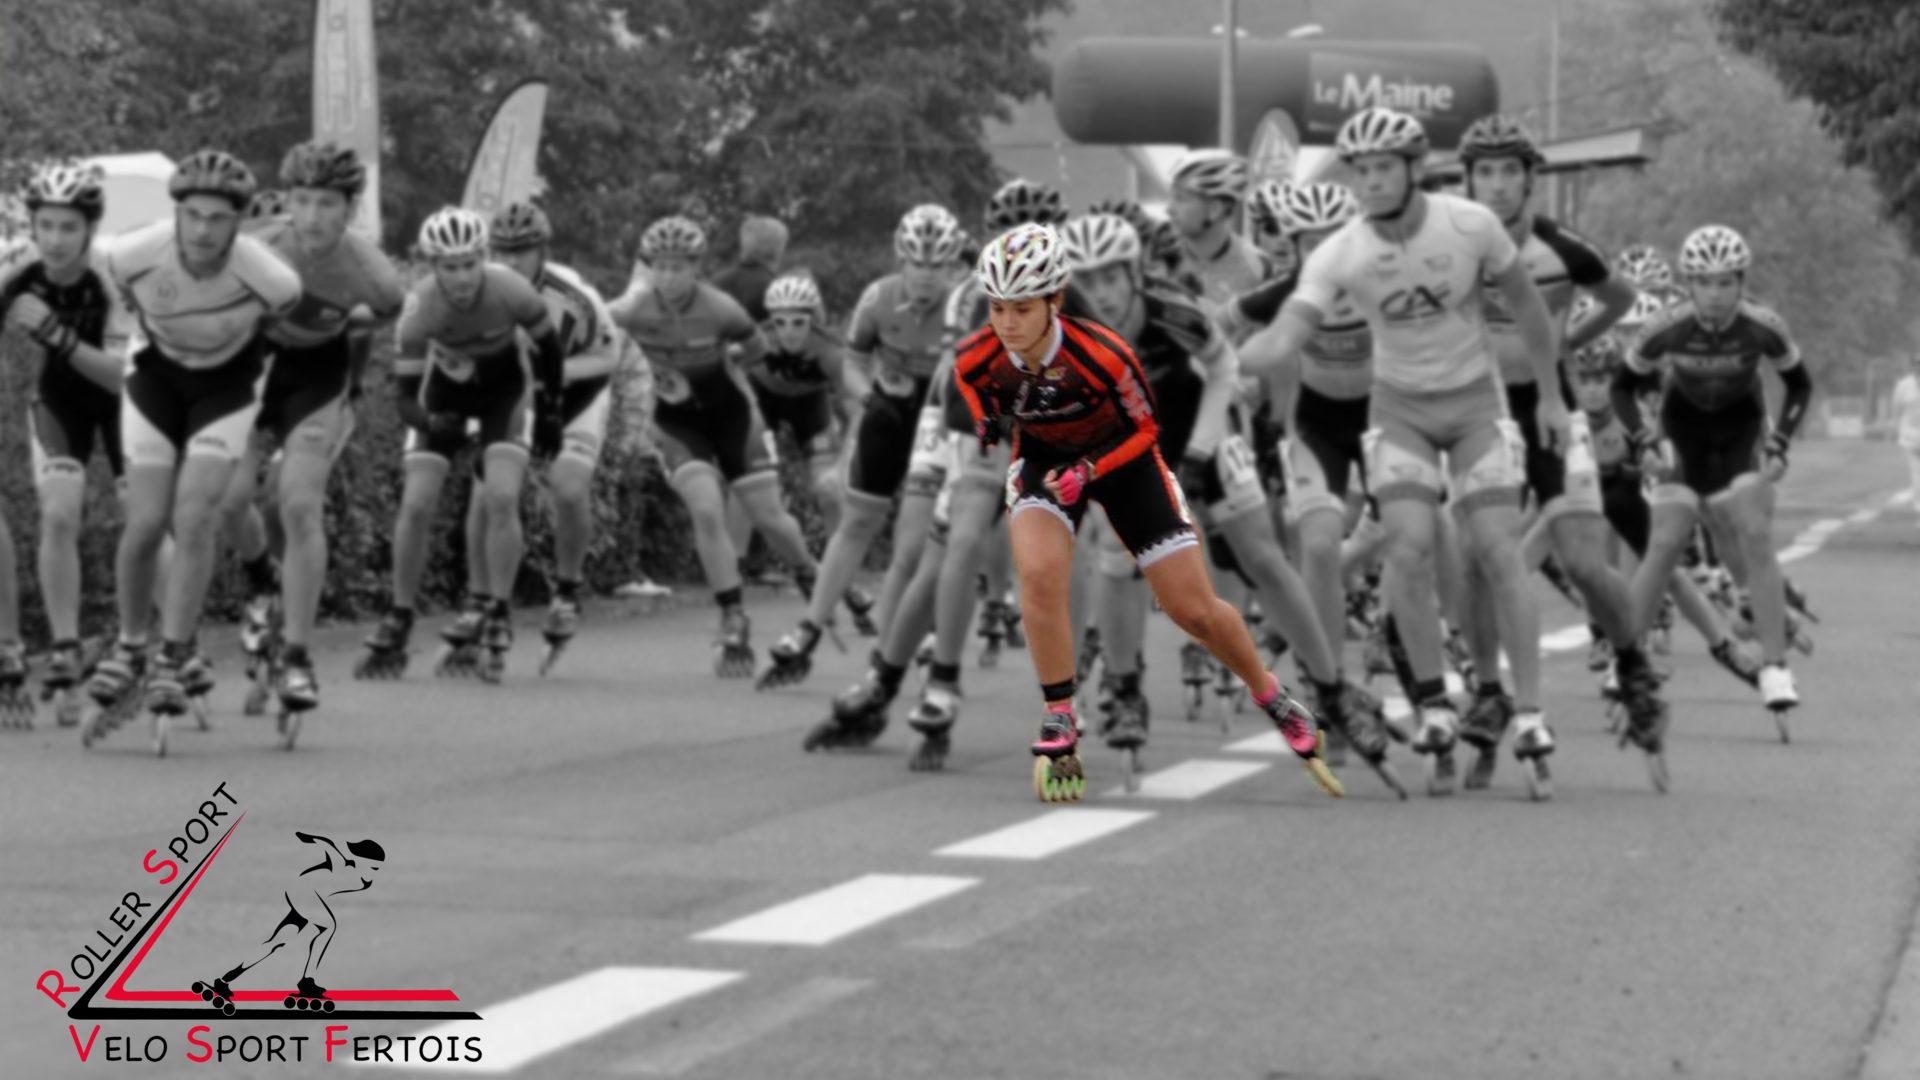 VSF Roller Sport